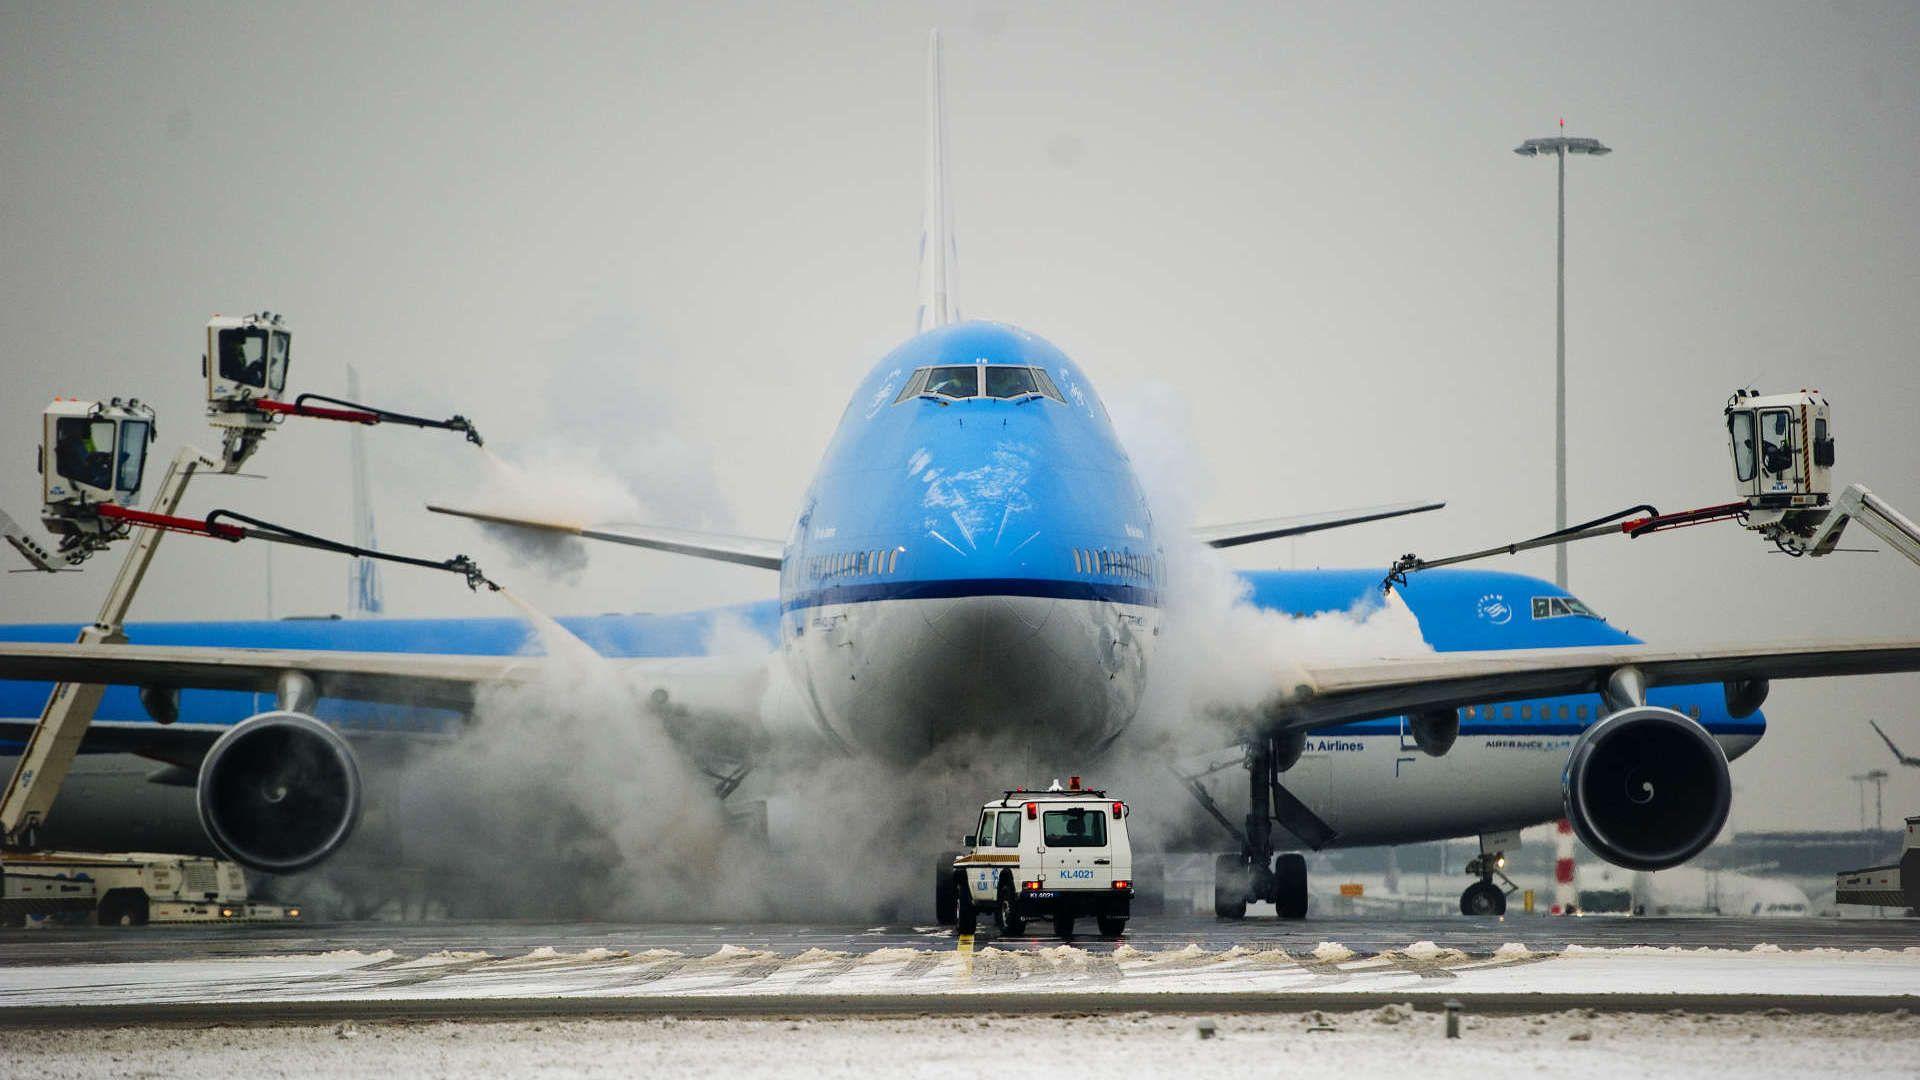 Deice ice baby klm blog vliegtuig aircraft helikopter